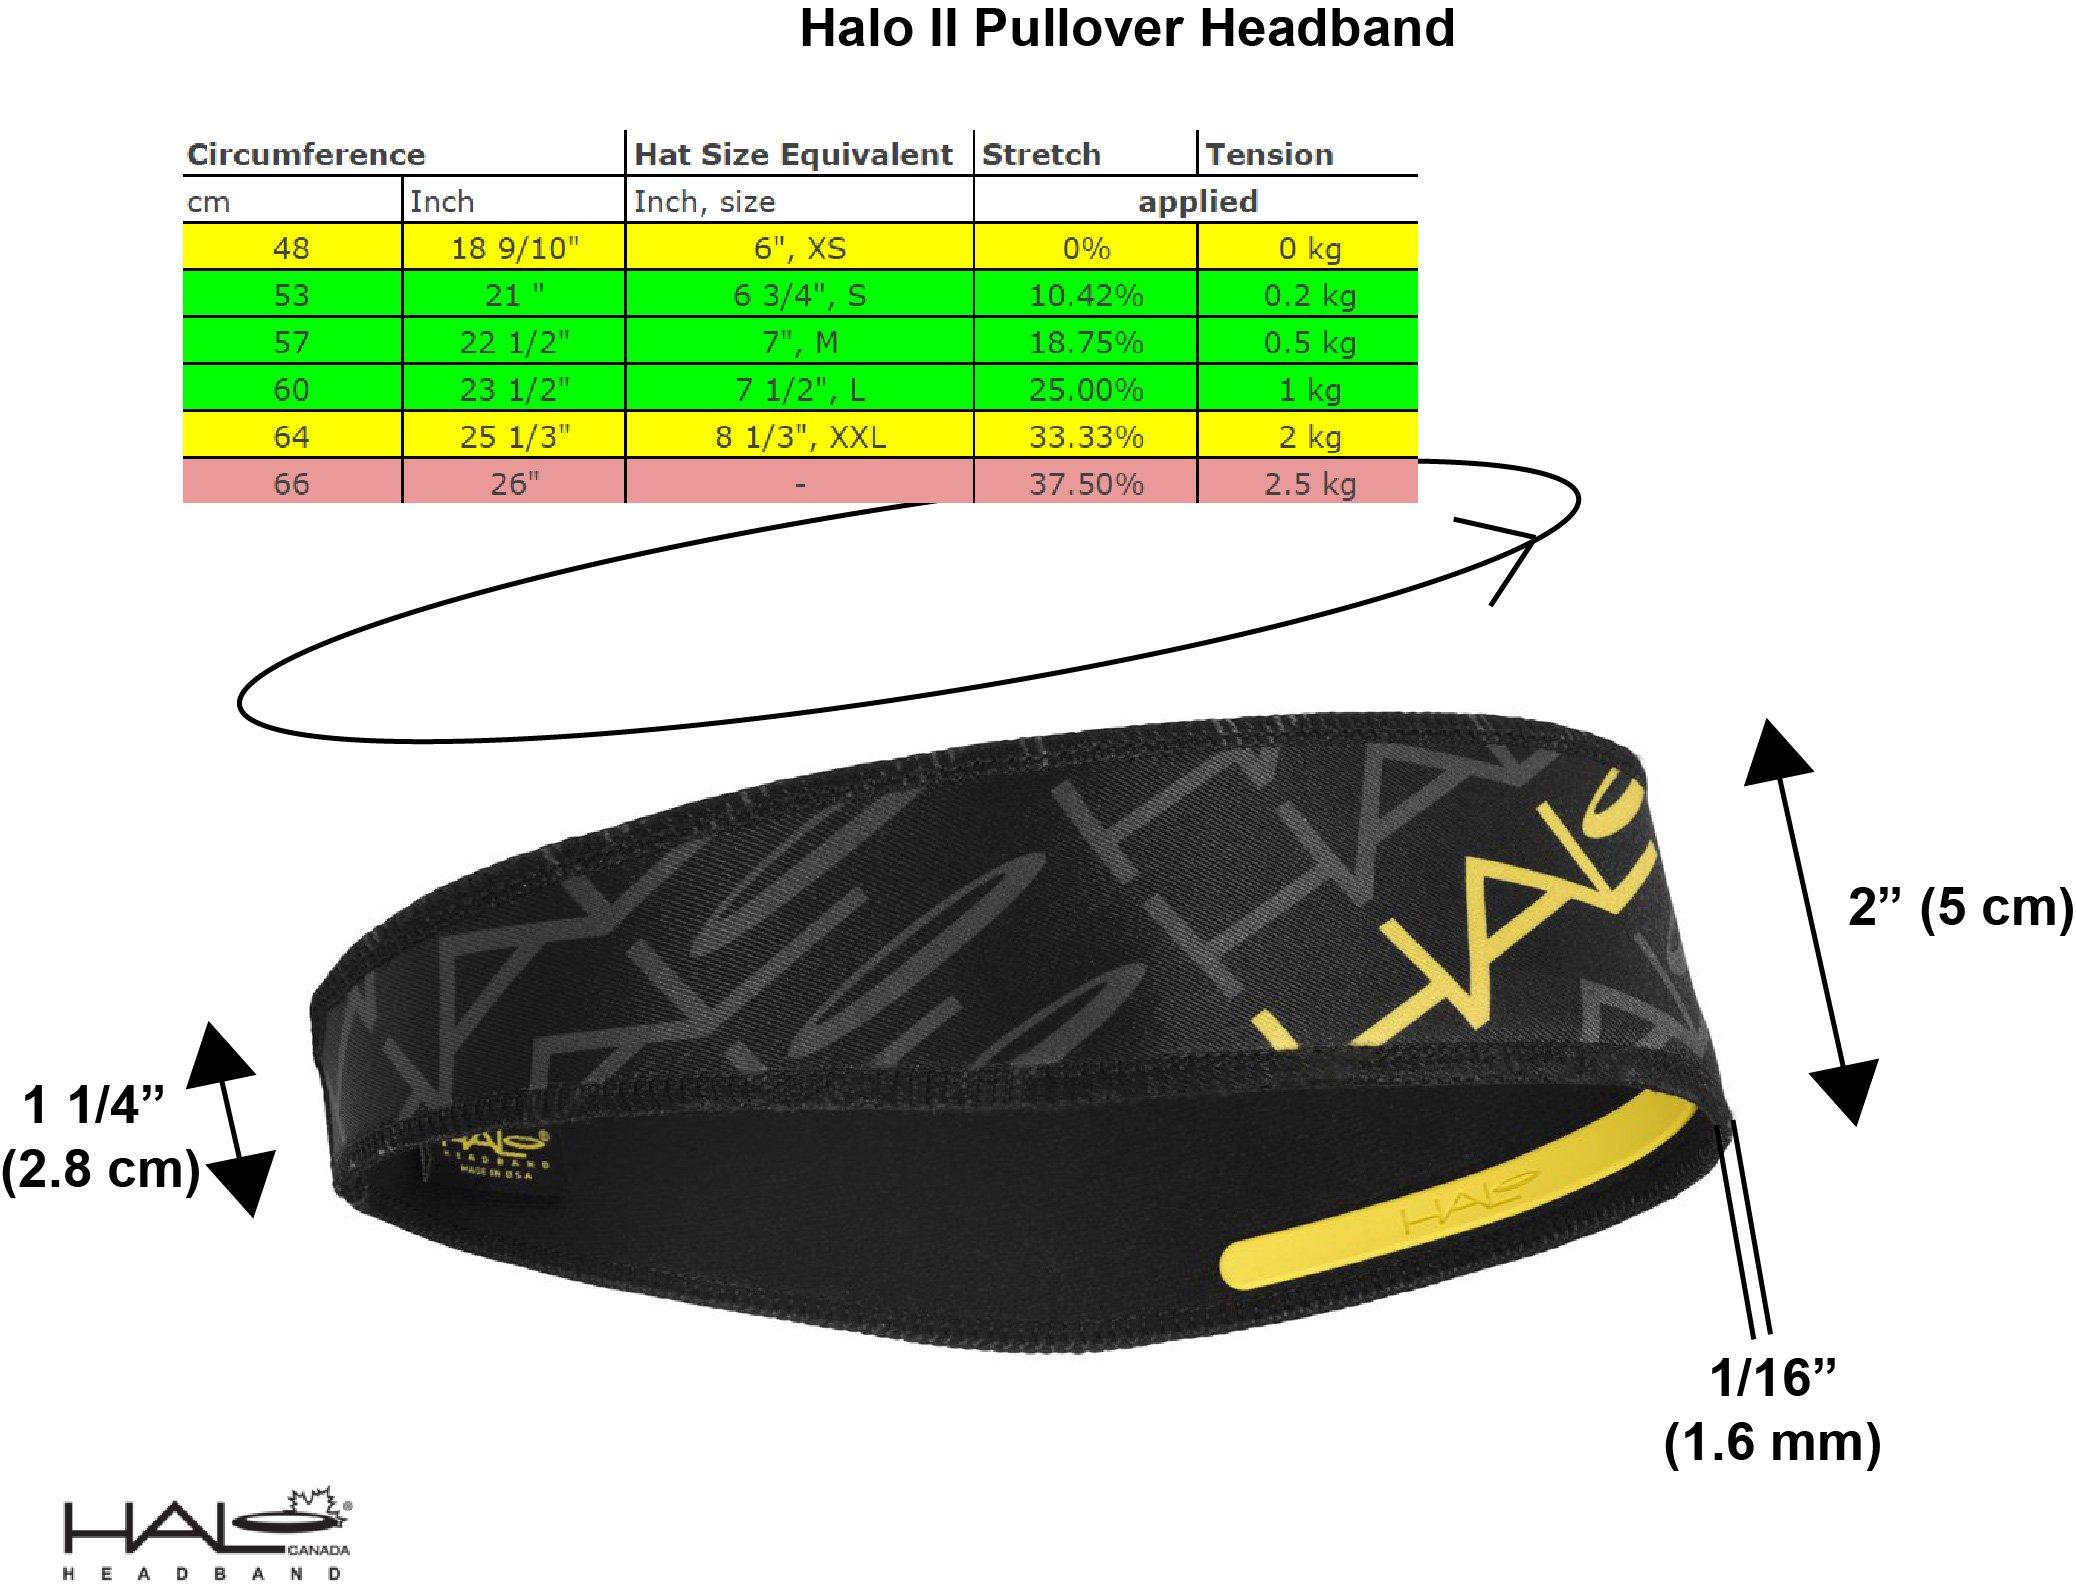 Halo-II-pullover-dimensions-full (1).jpg